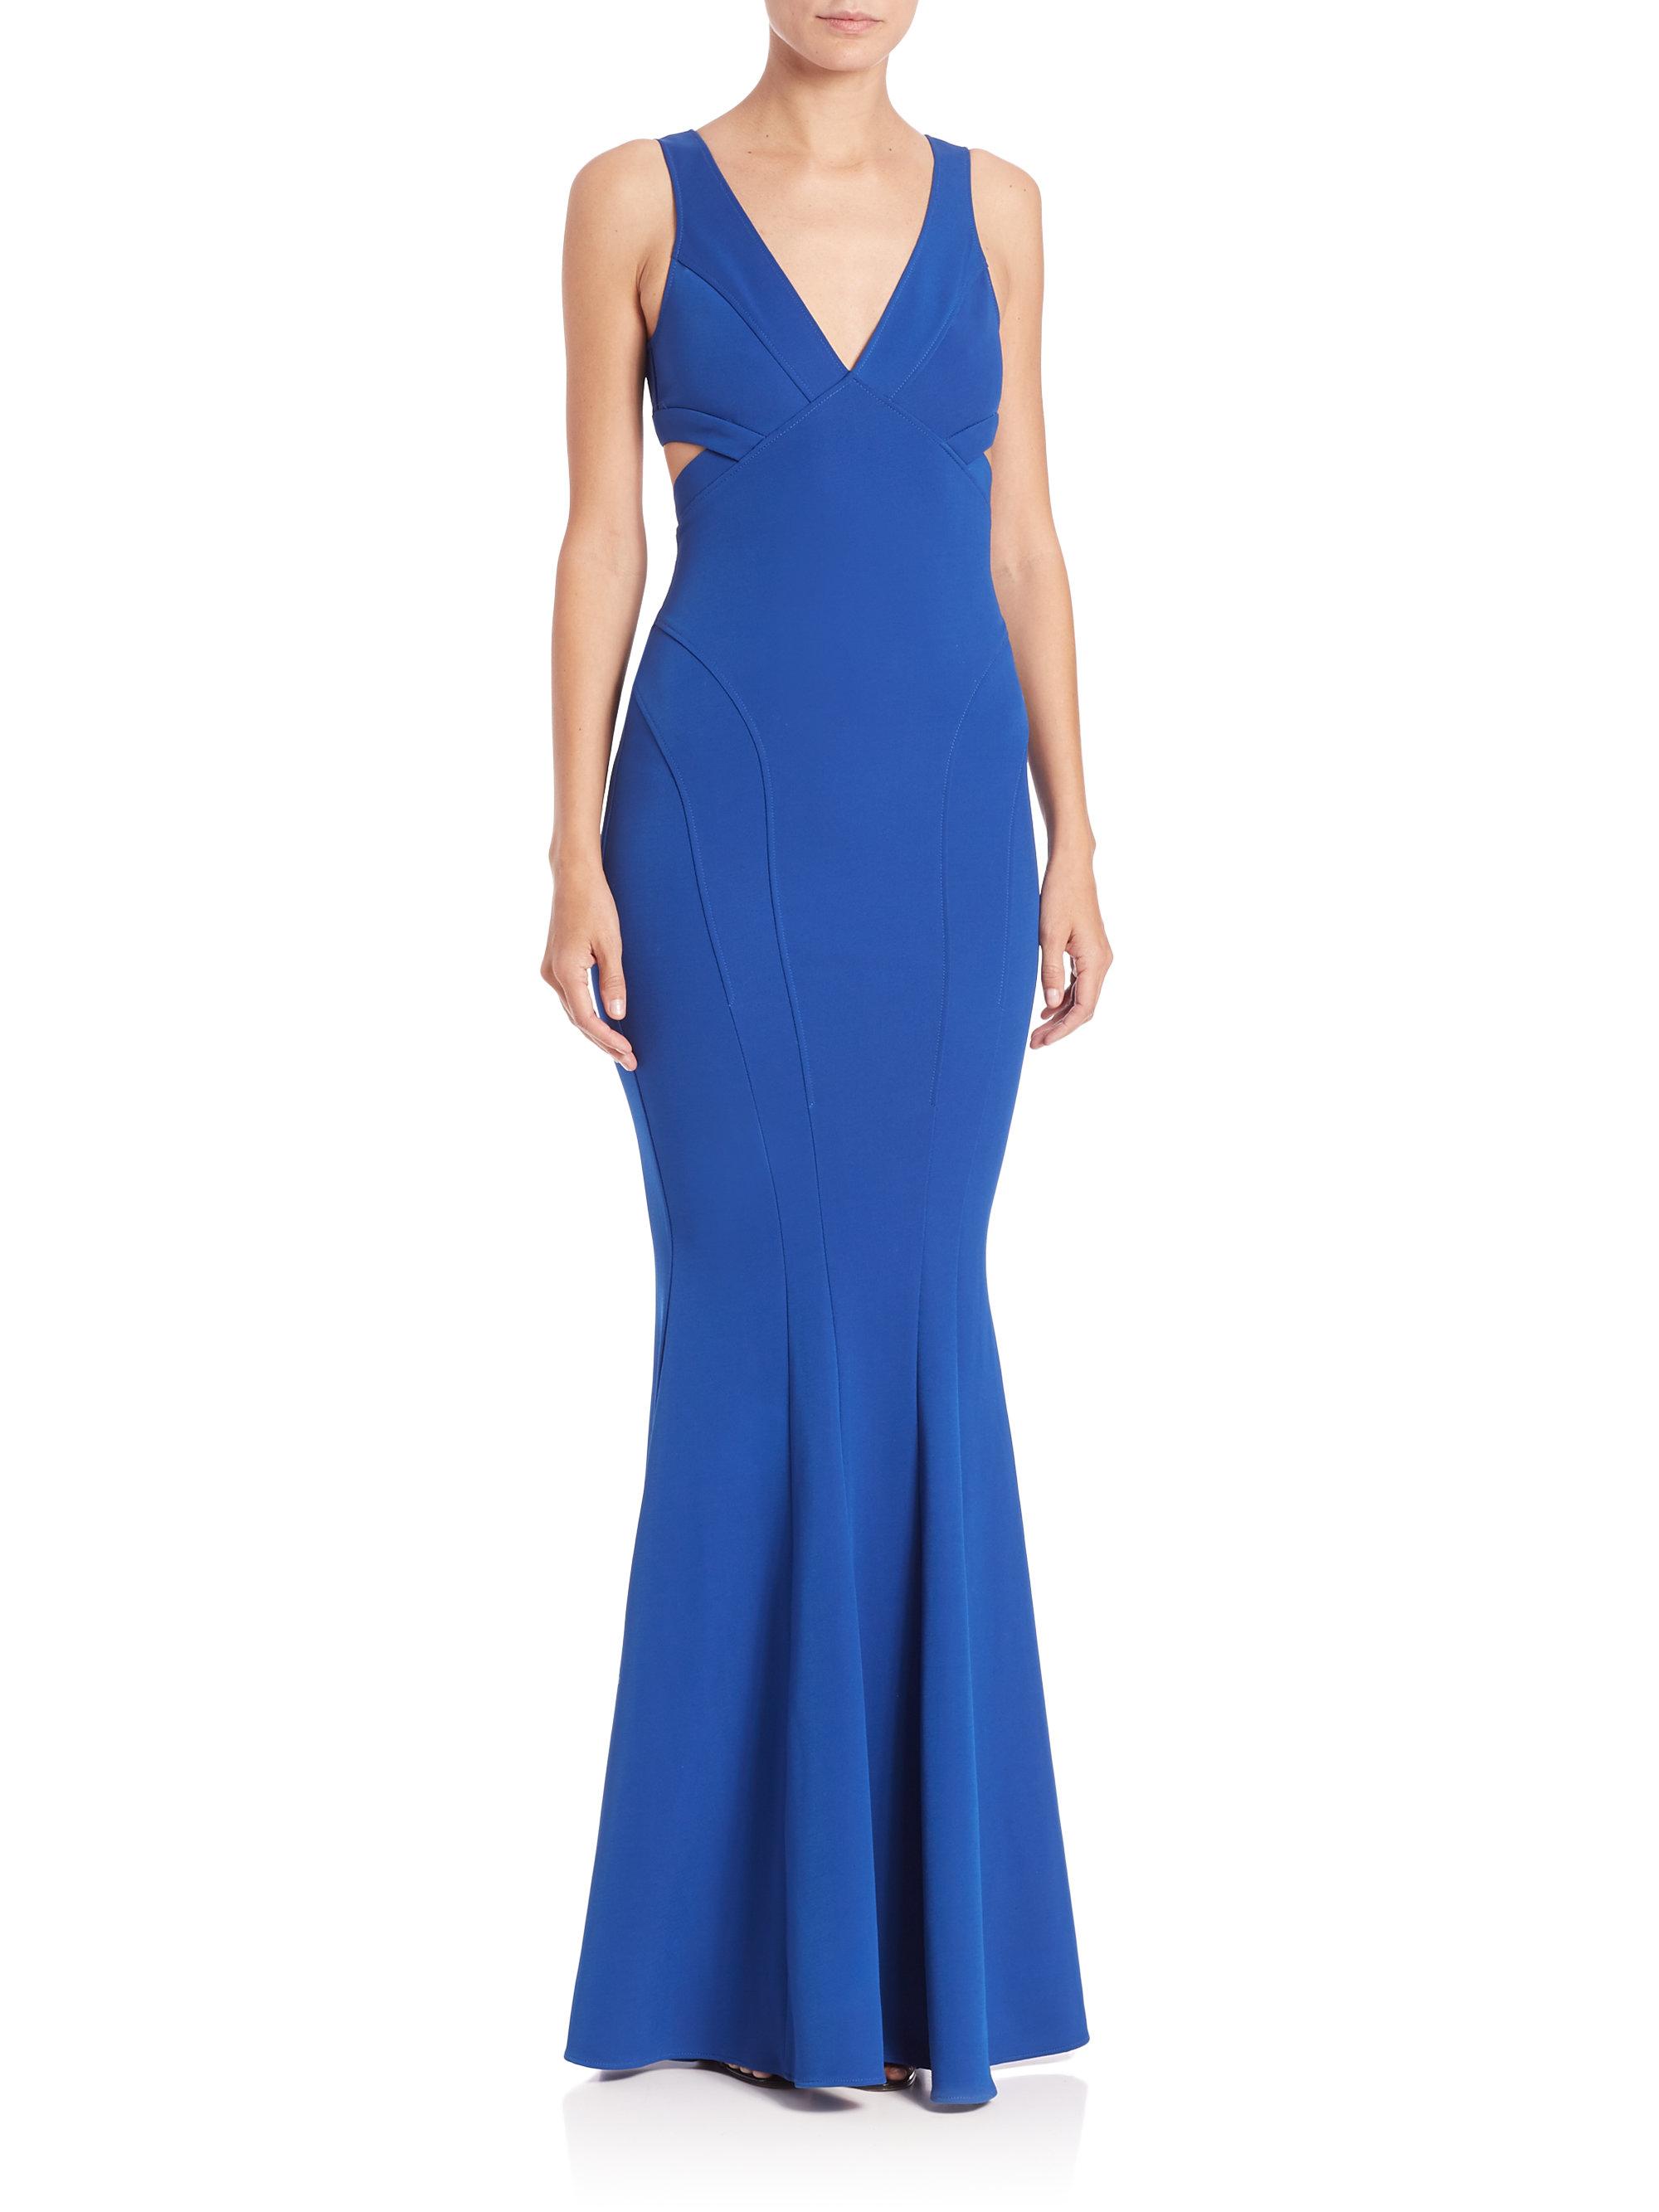 Lyst - Zac Zac Posen Jax Bondage Jersey Gown in Blue